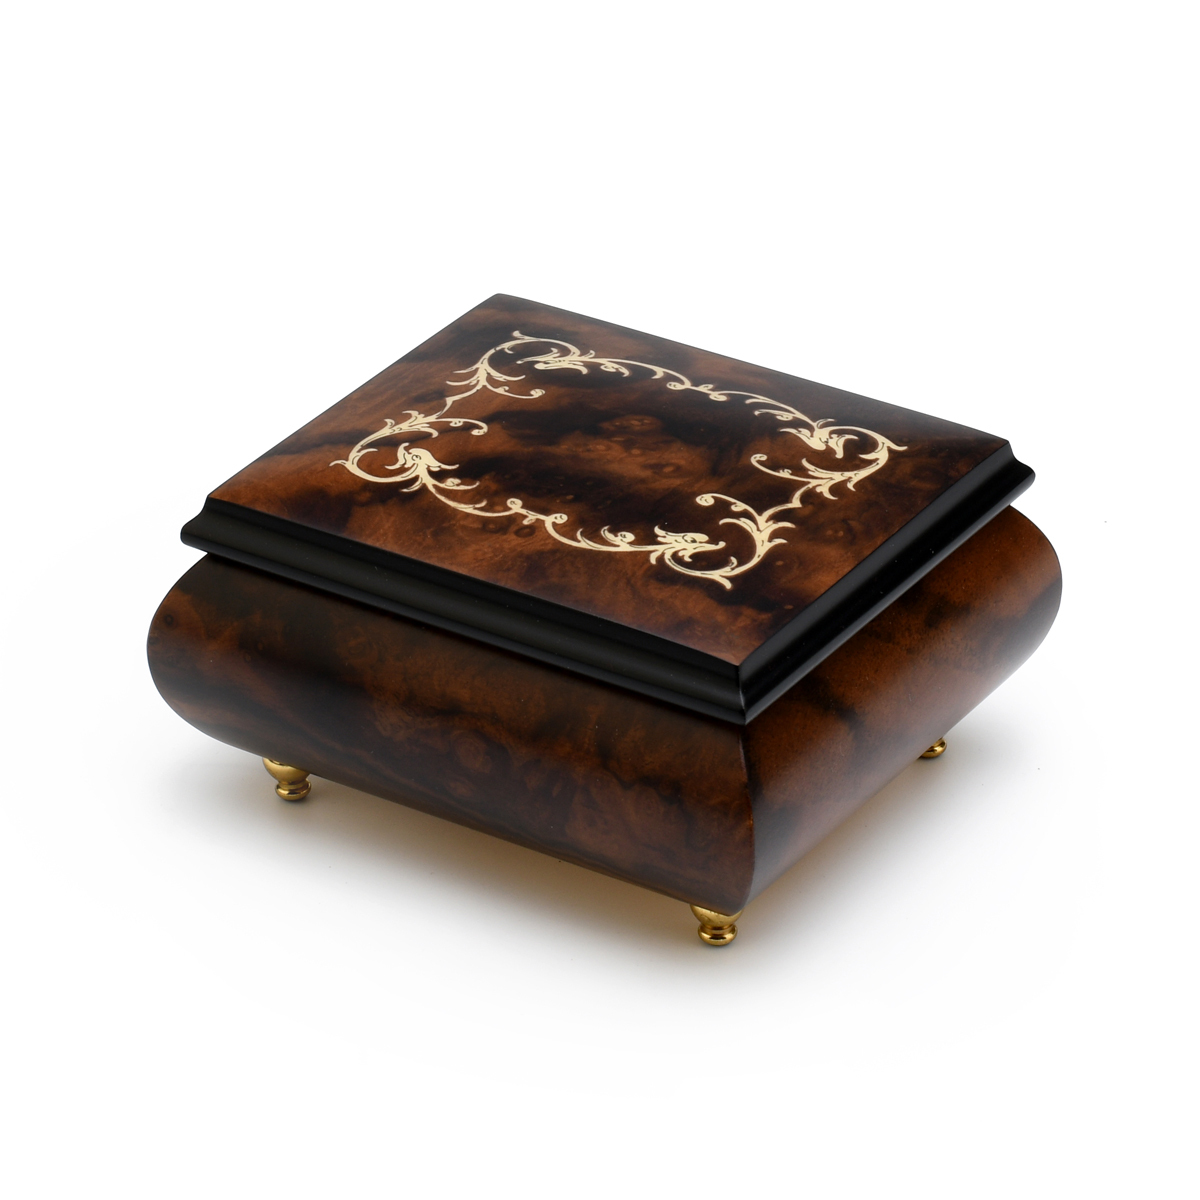 Classic Walnut Stain Arabesque Wood Inlay Music Box